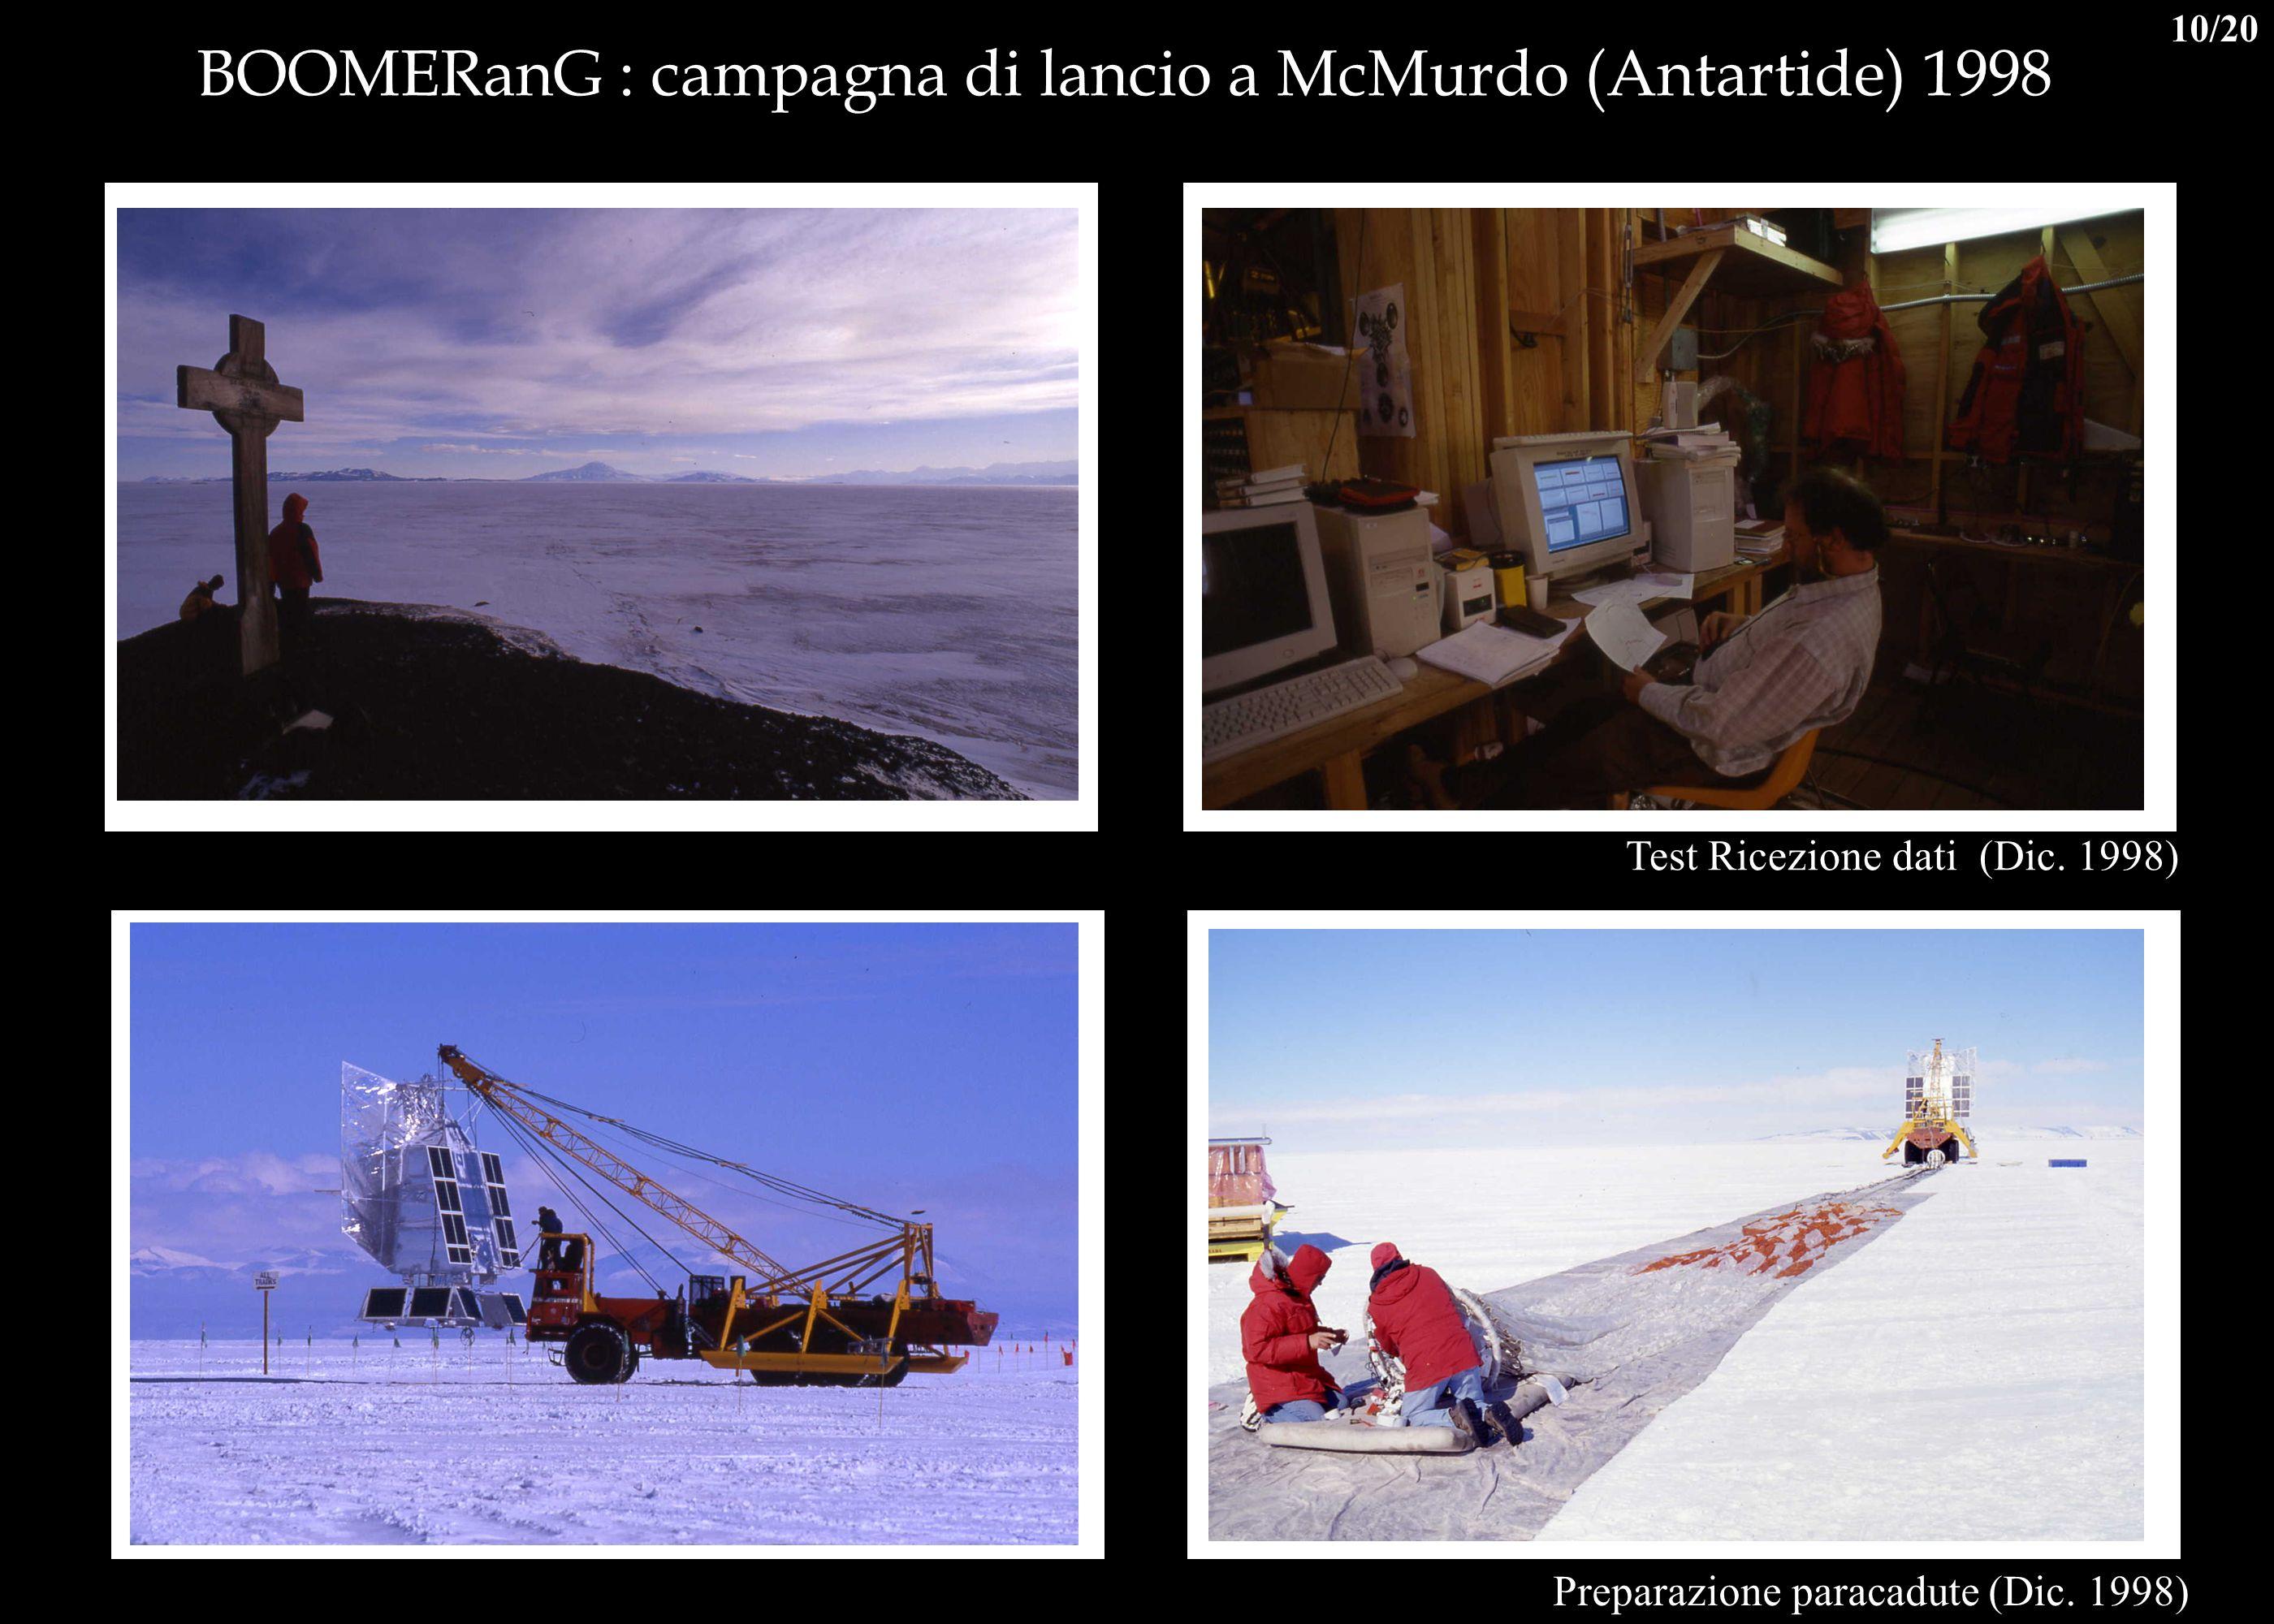 BOOMERanG : campagna di lancio a McMurdo (Antartide) 1998 Test Ricezione dati (Dic. 1998) Preparazione paracadute (Dic. 1998) 10/20